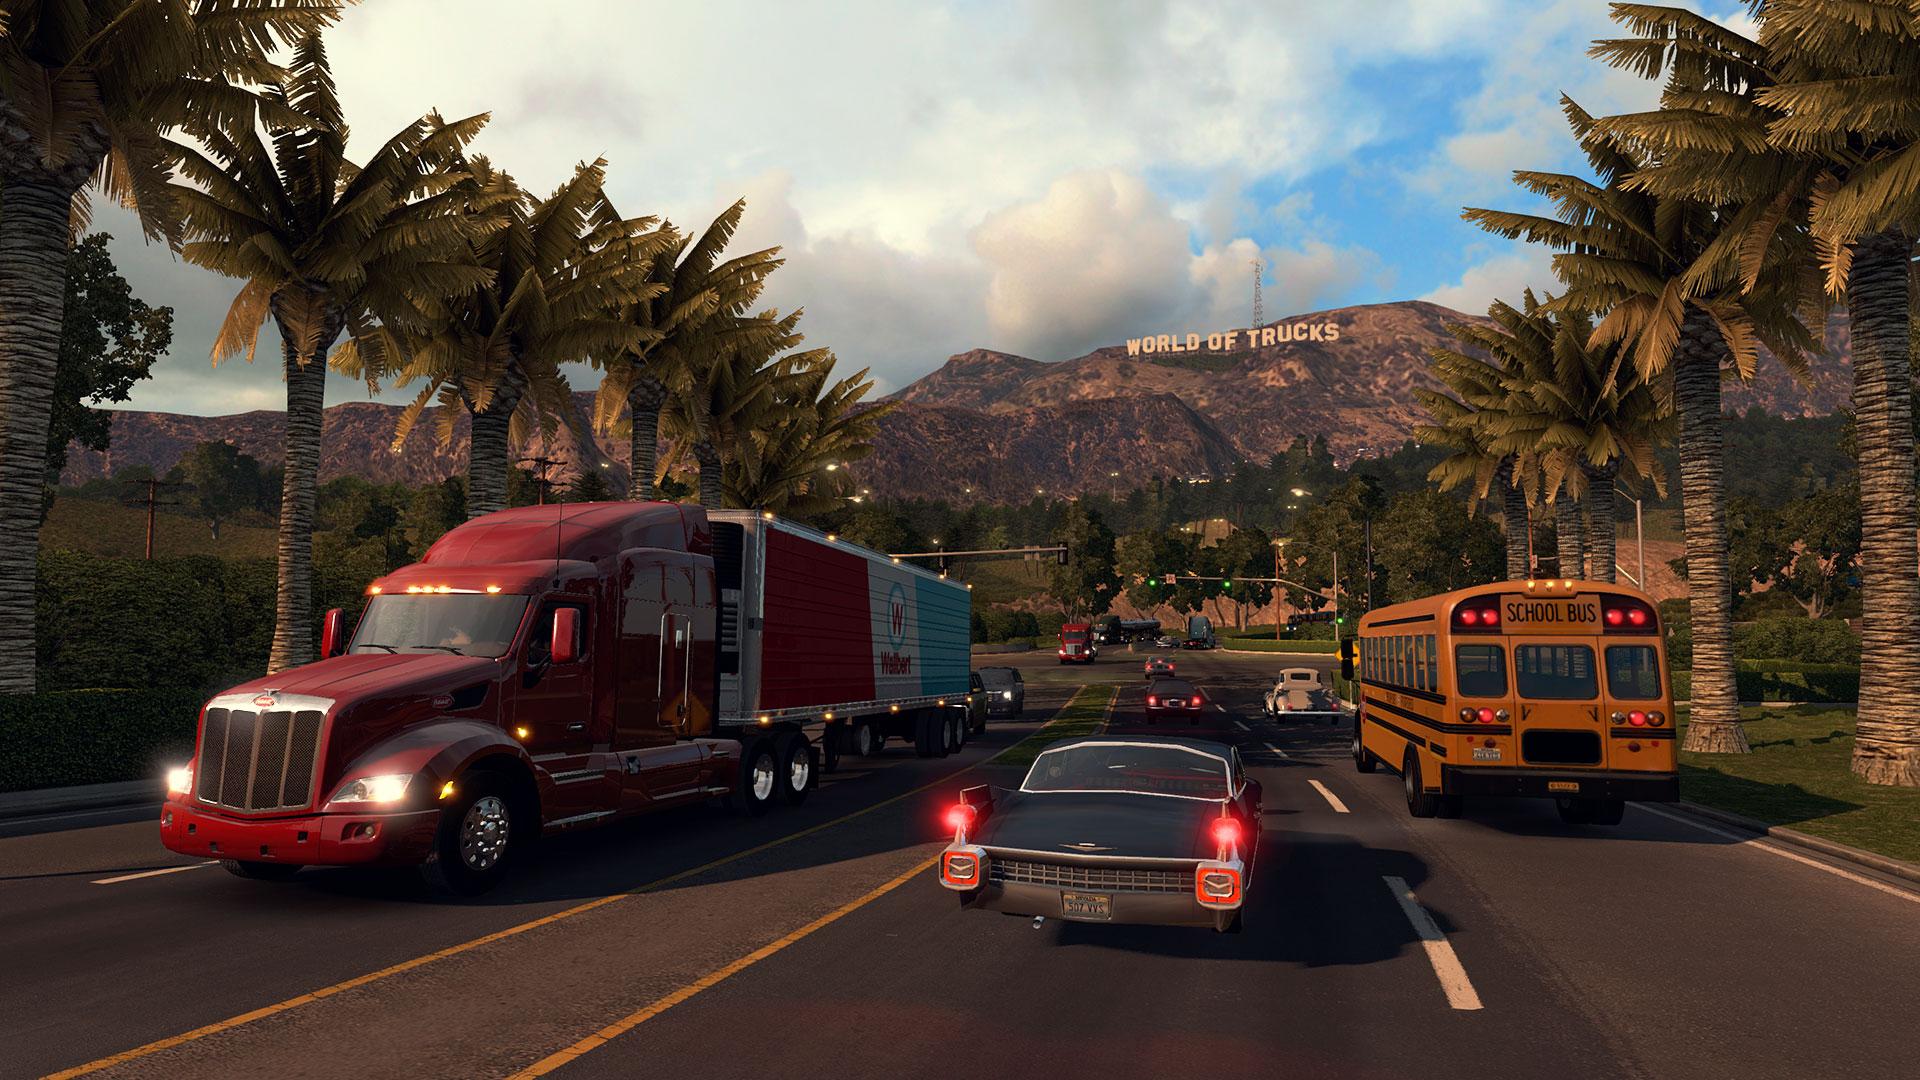 美国卡车模拟 VR (American Truck Simulator)插图(1)